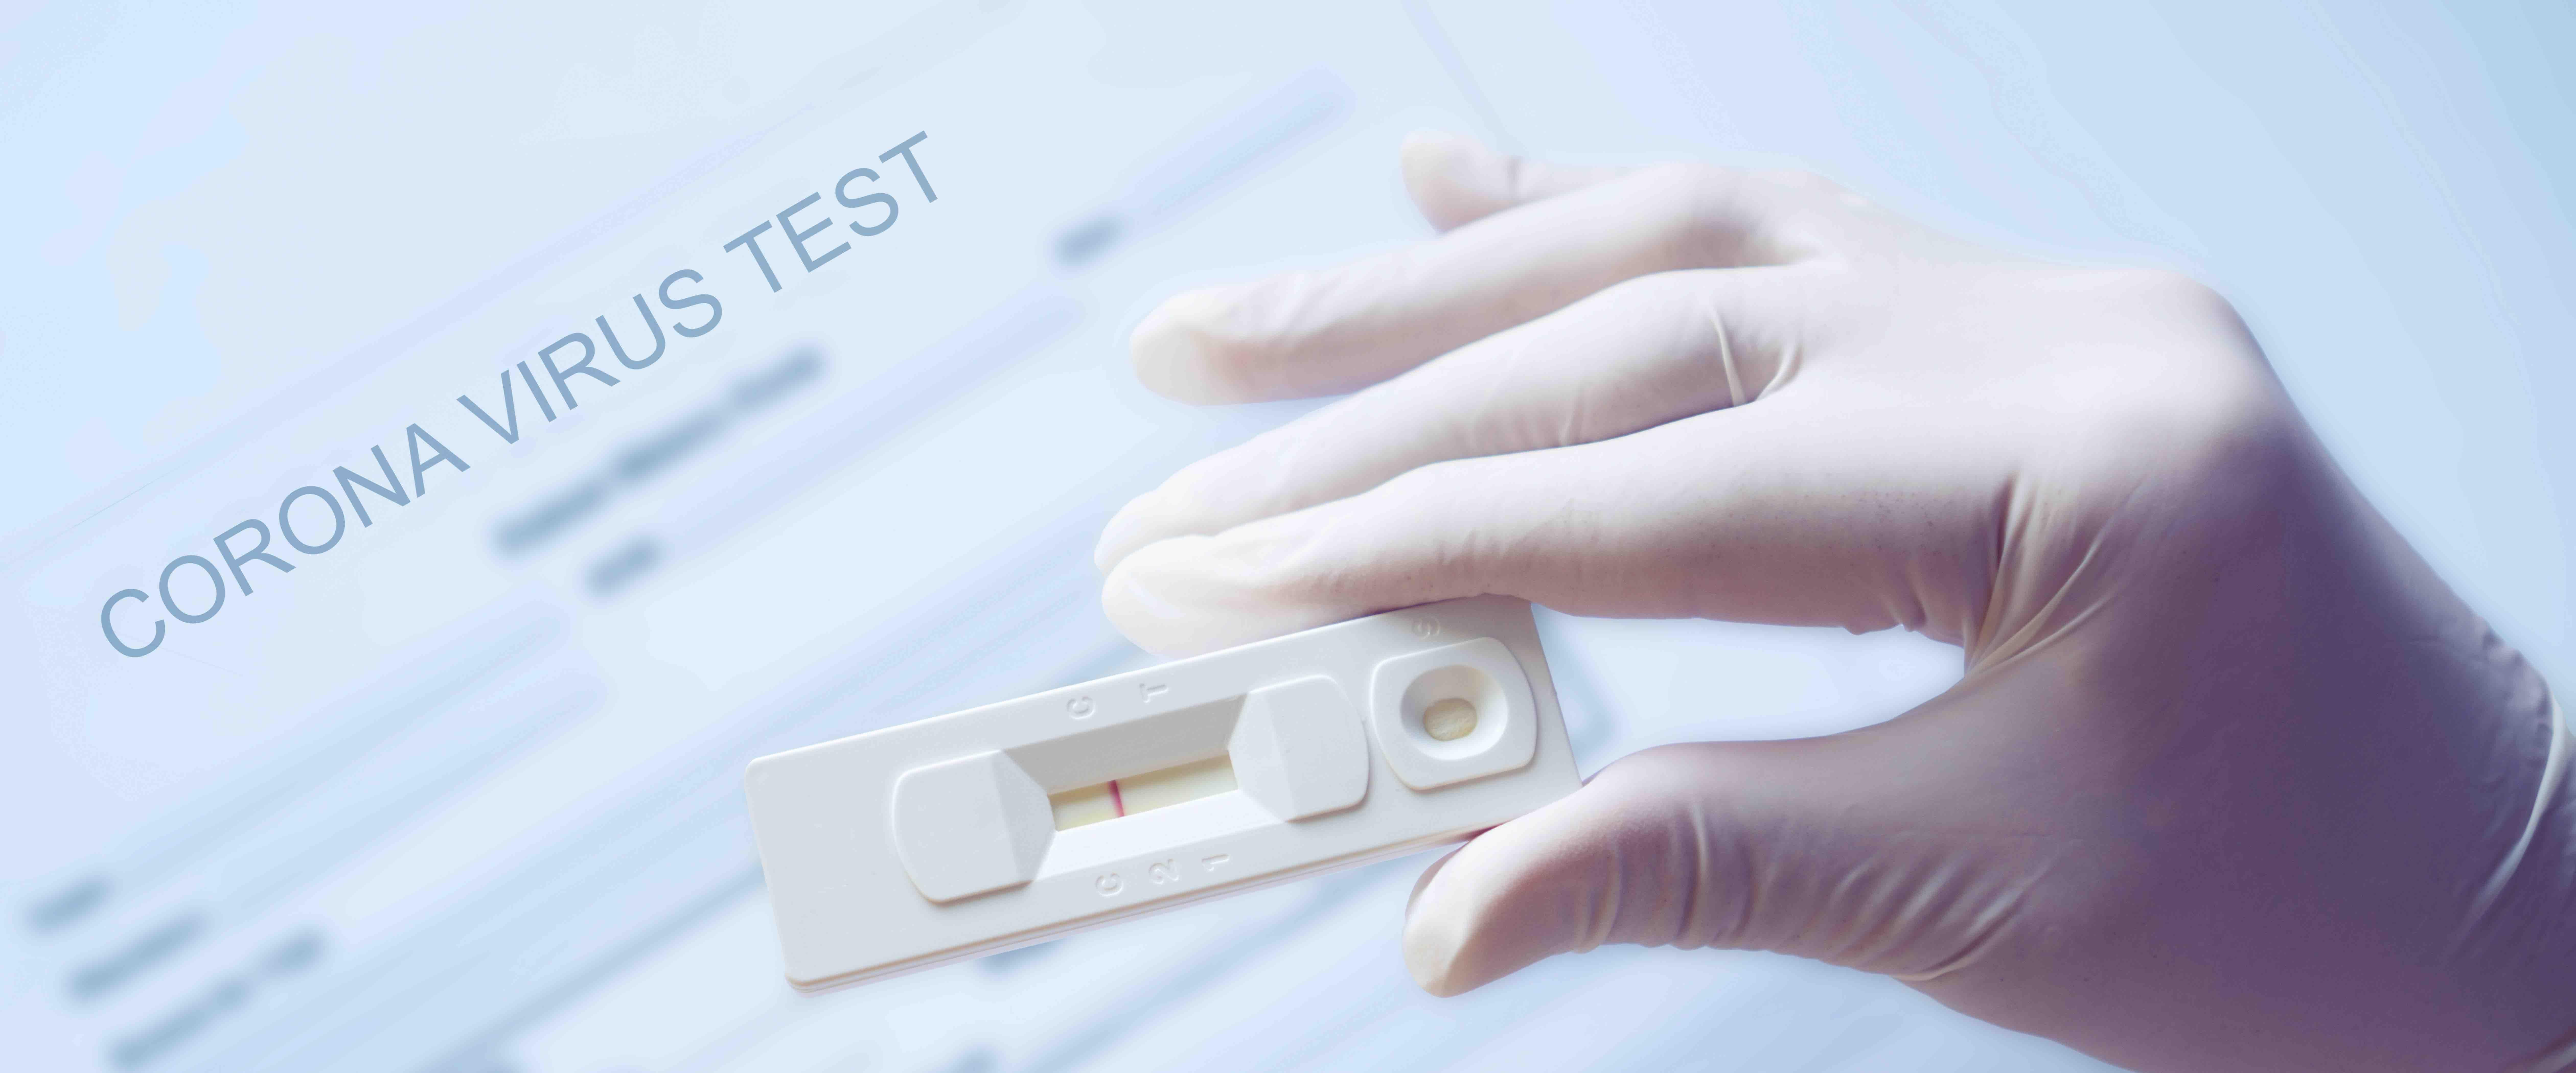 Qatar S Plans For Rapid Covid 19 Test Kit Qatar Foundation